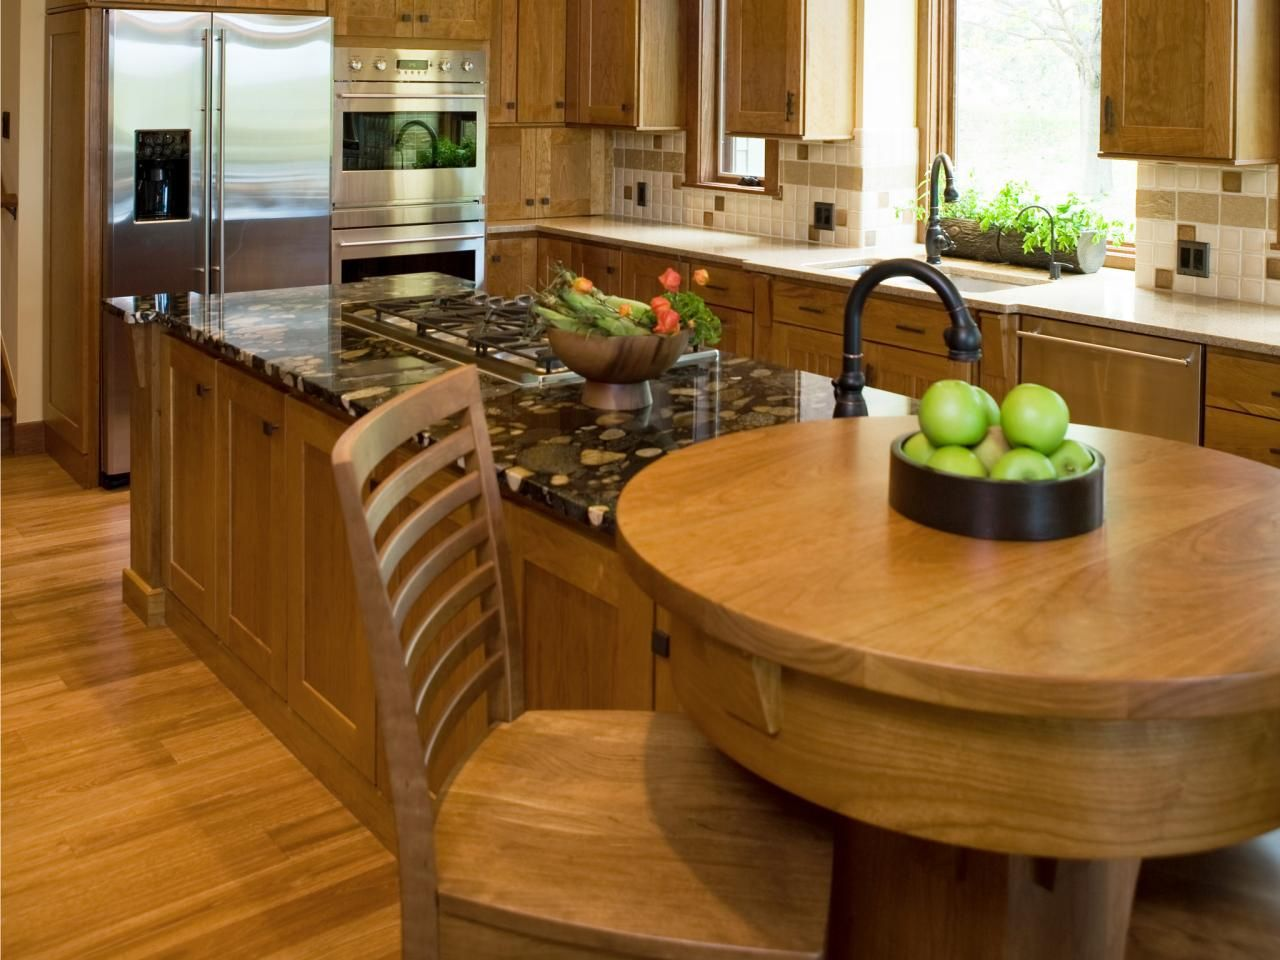 Breakfast Bar Kitchen island   Backsplash Ideas for Small Kitchen ...